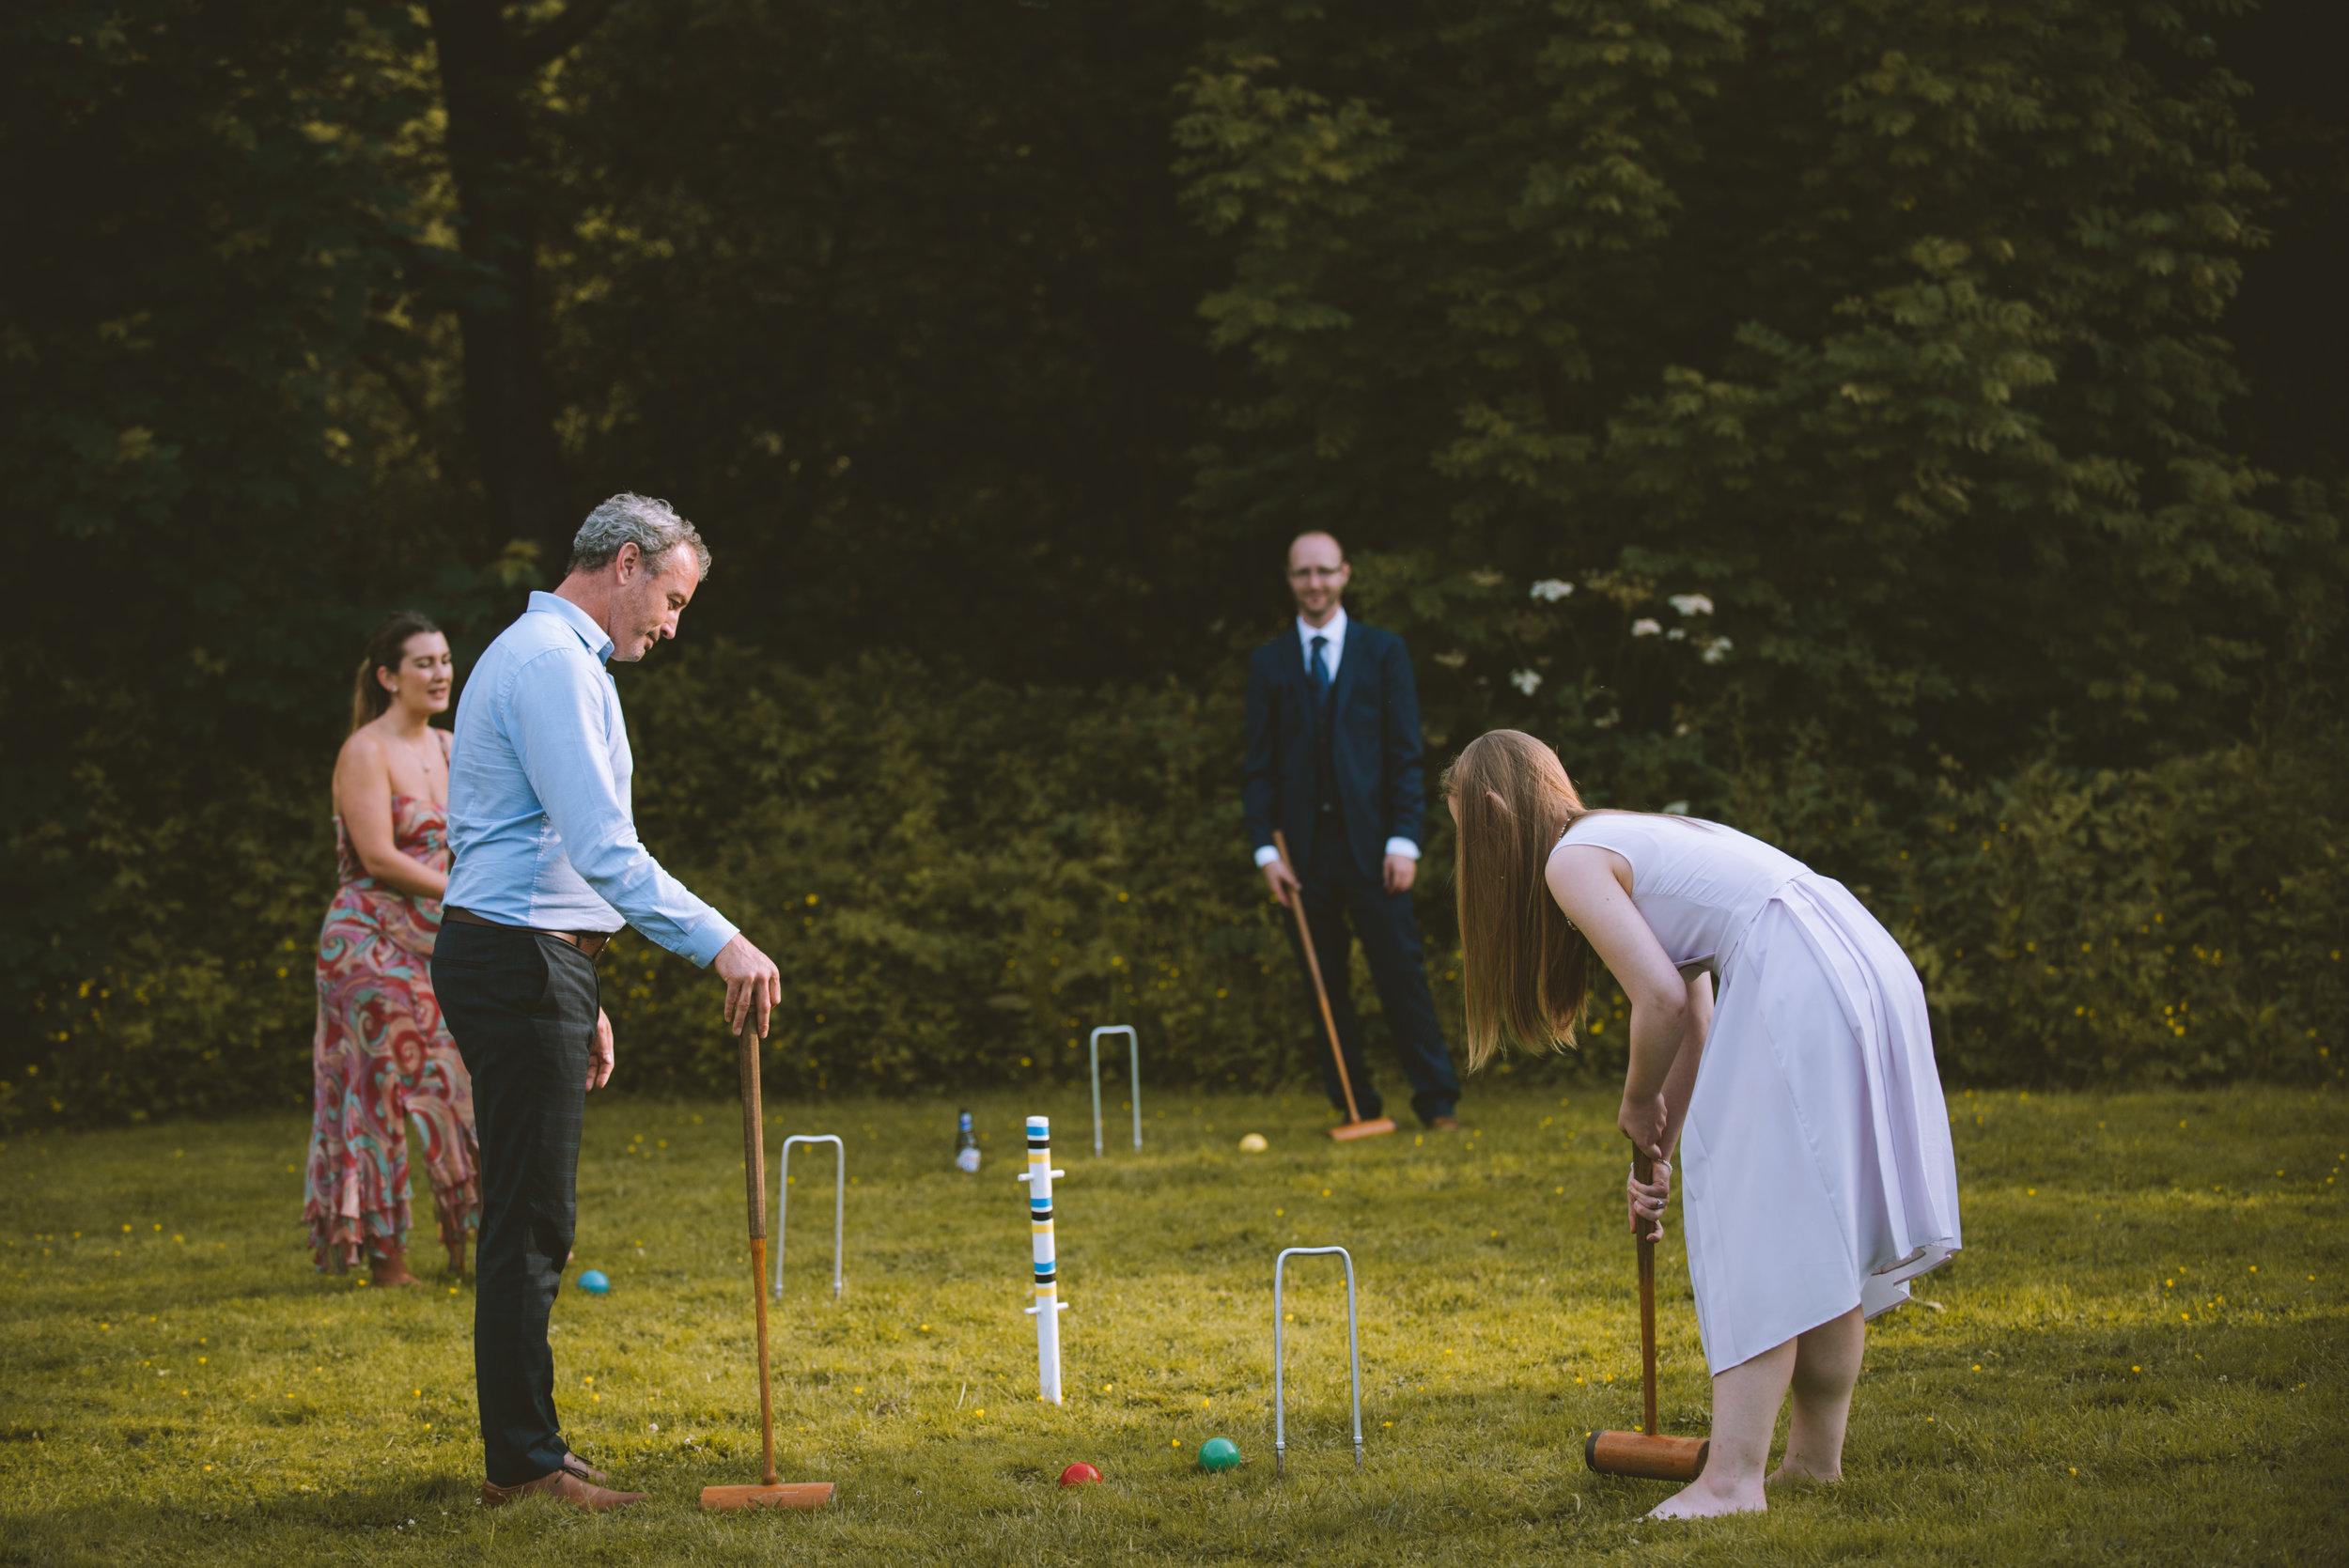 wedding-photographer-nancarrow-52.jpg